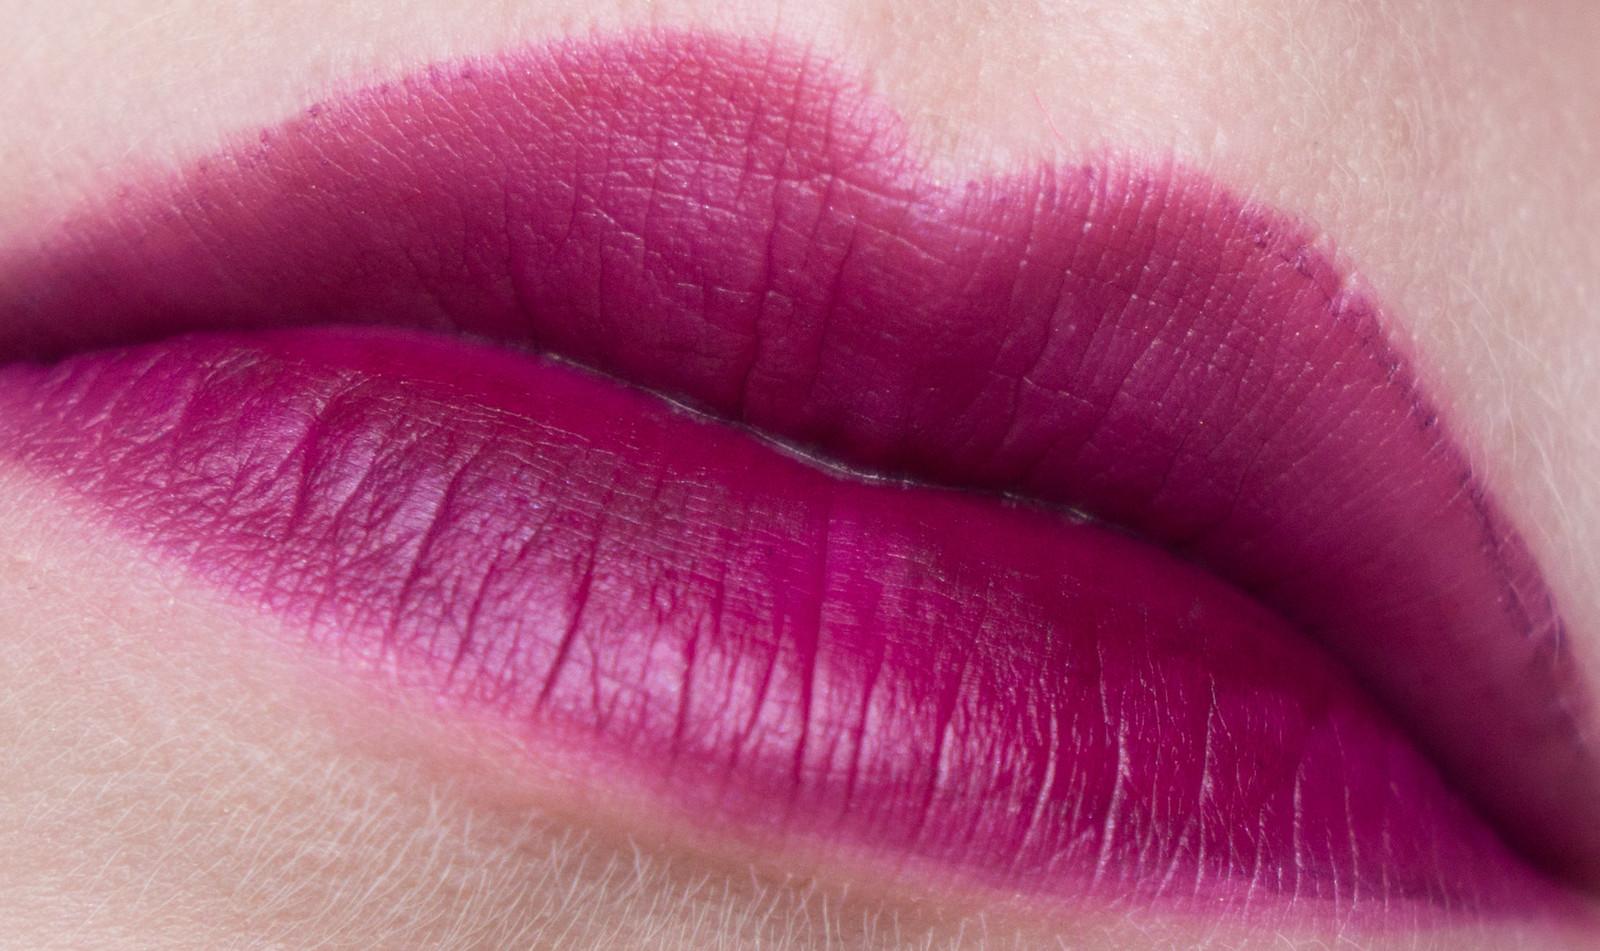 PUPA Made To Last Lip Tint 008 Hot Burgundy